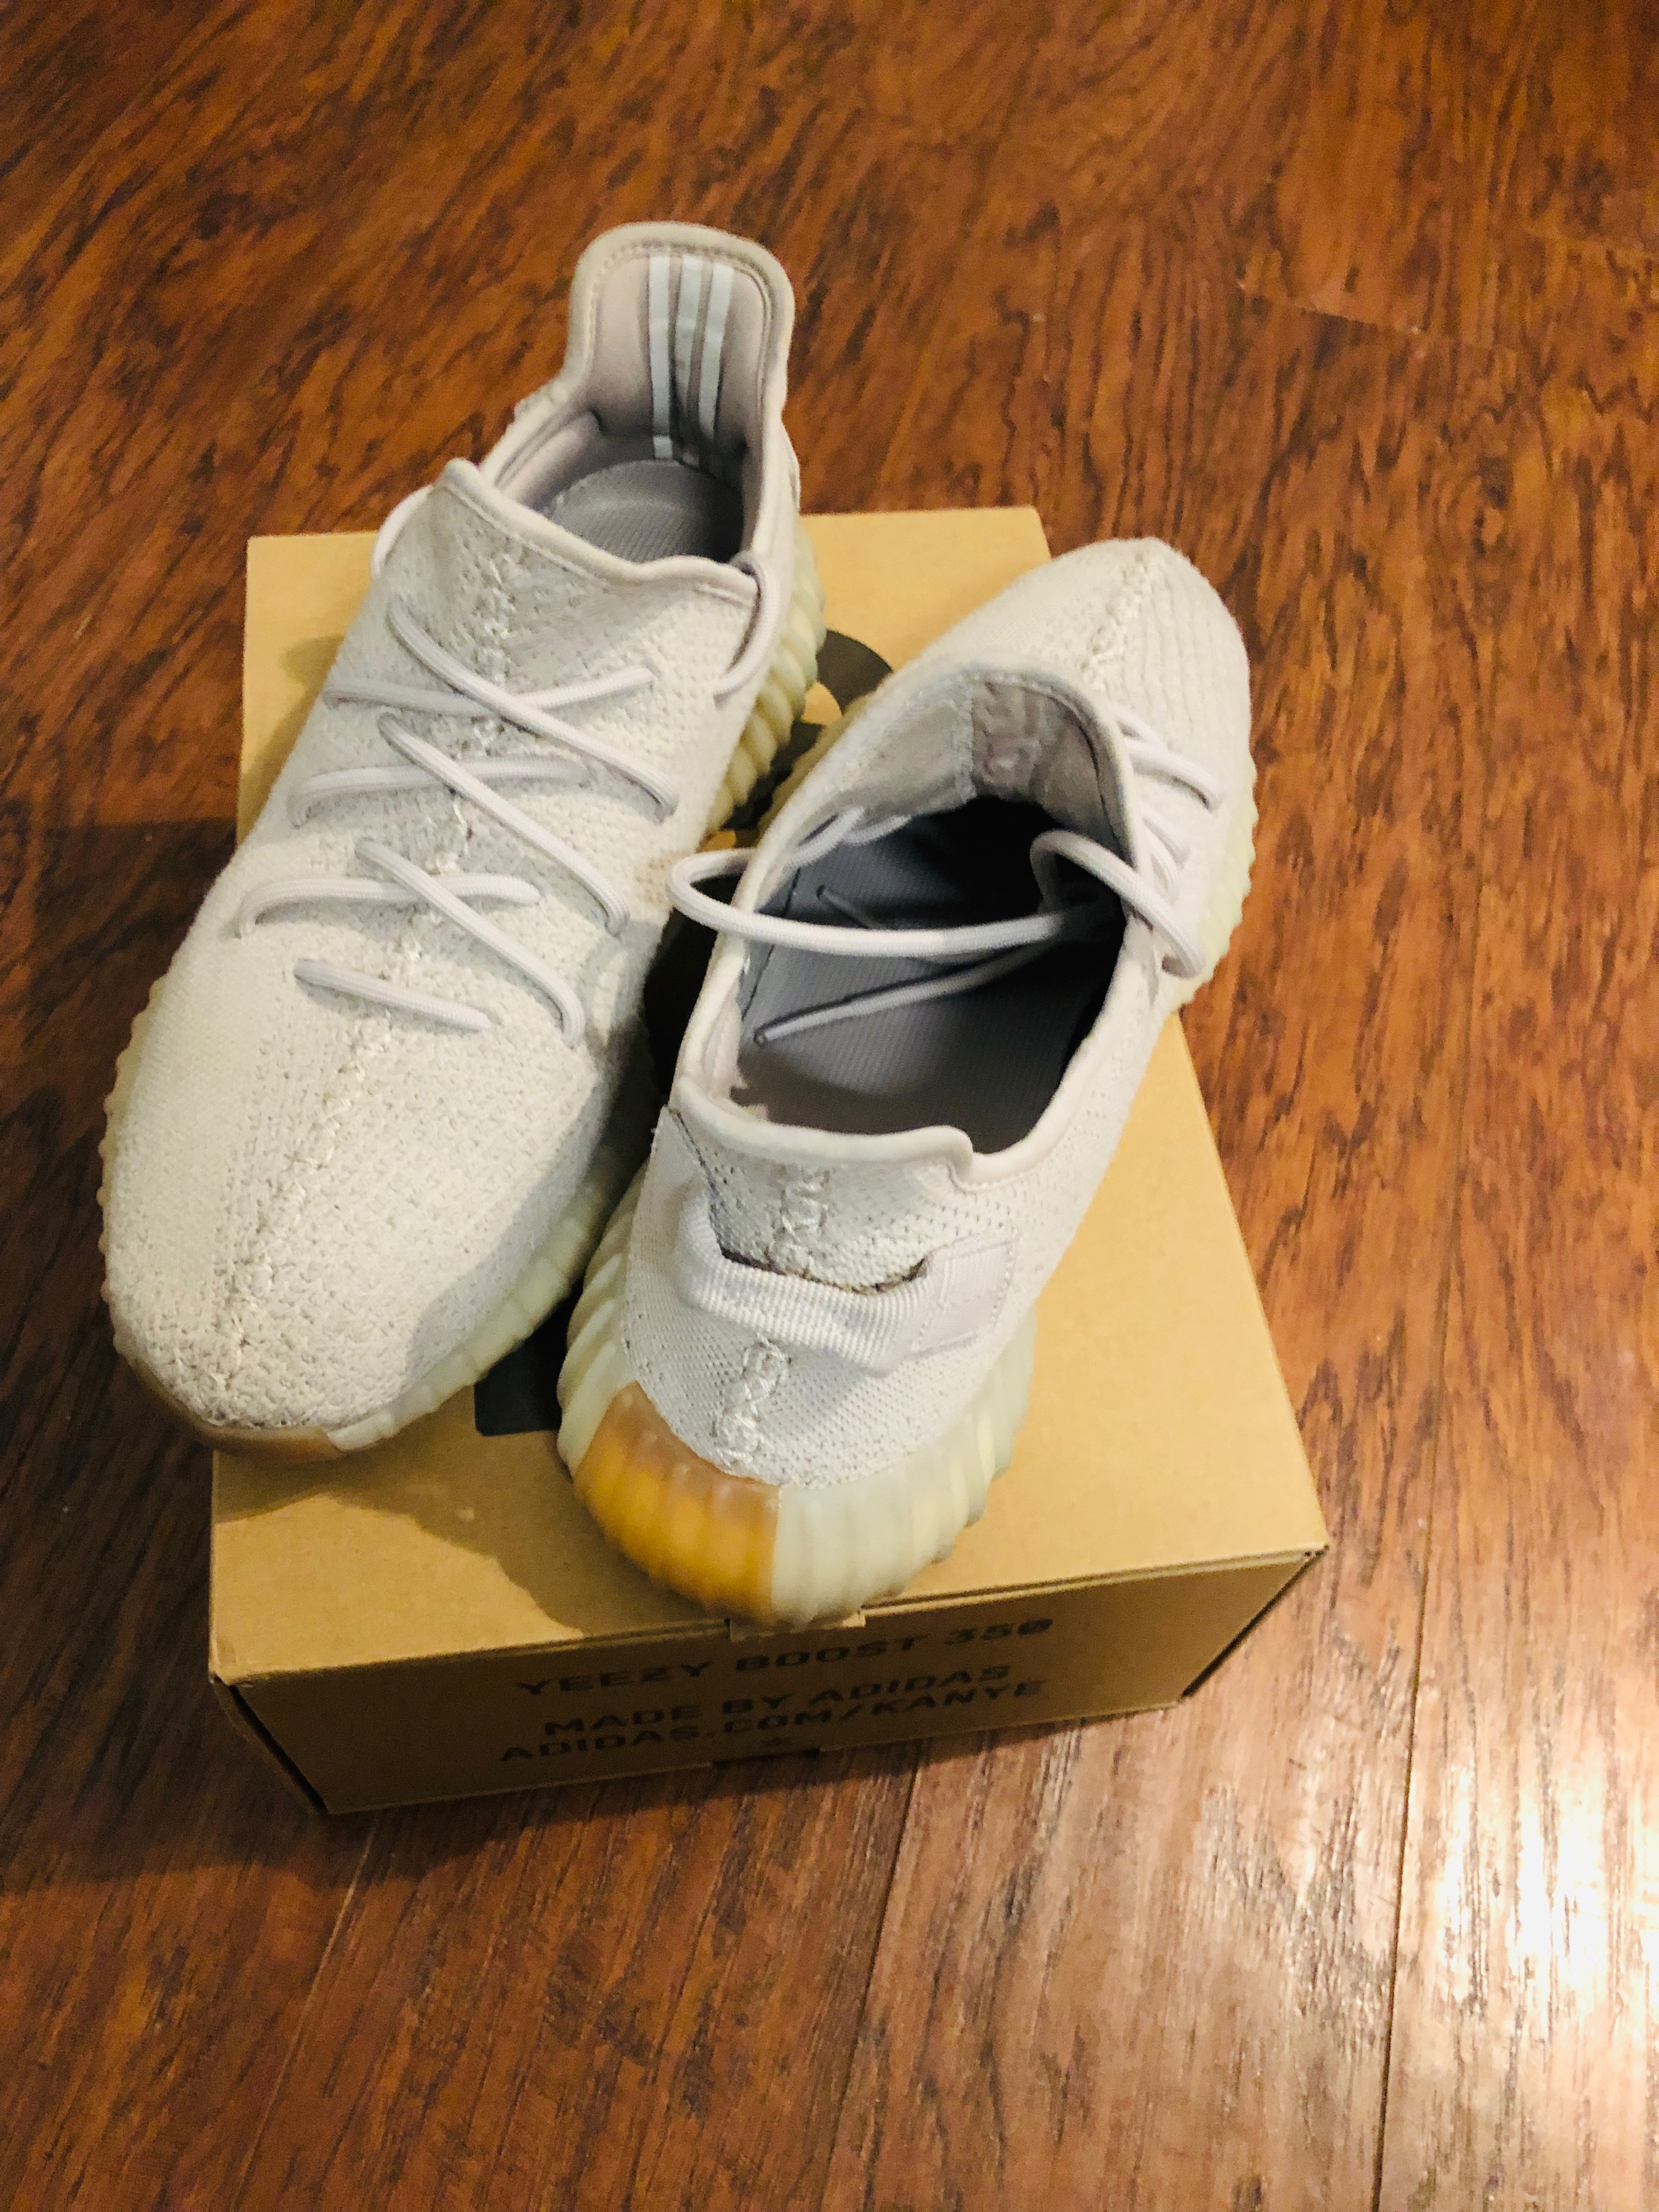 75d8a2534f8 Adidas Kanye West ×. Yeezy Boost 350 V2 Sesame